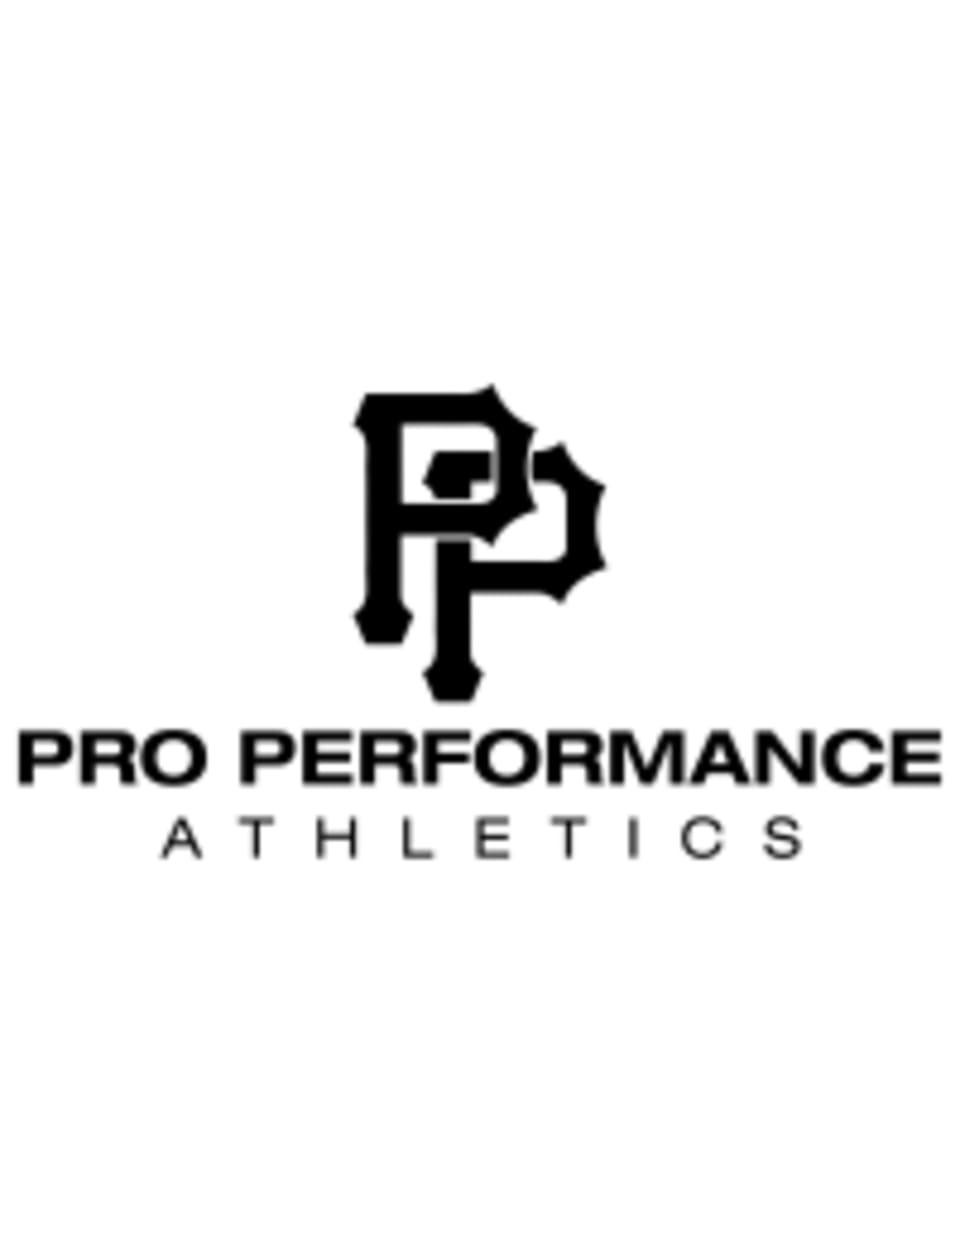 Pro Performance Athletics logo